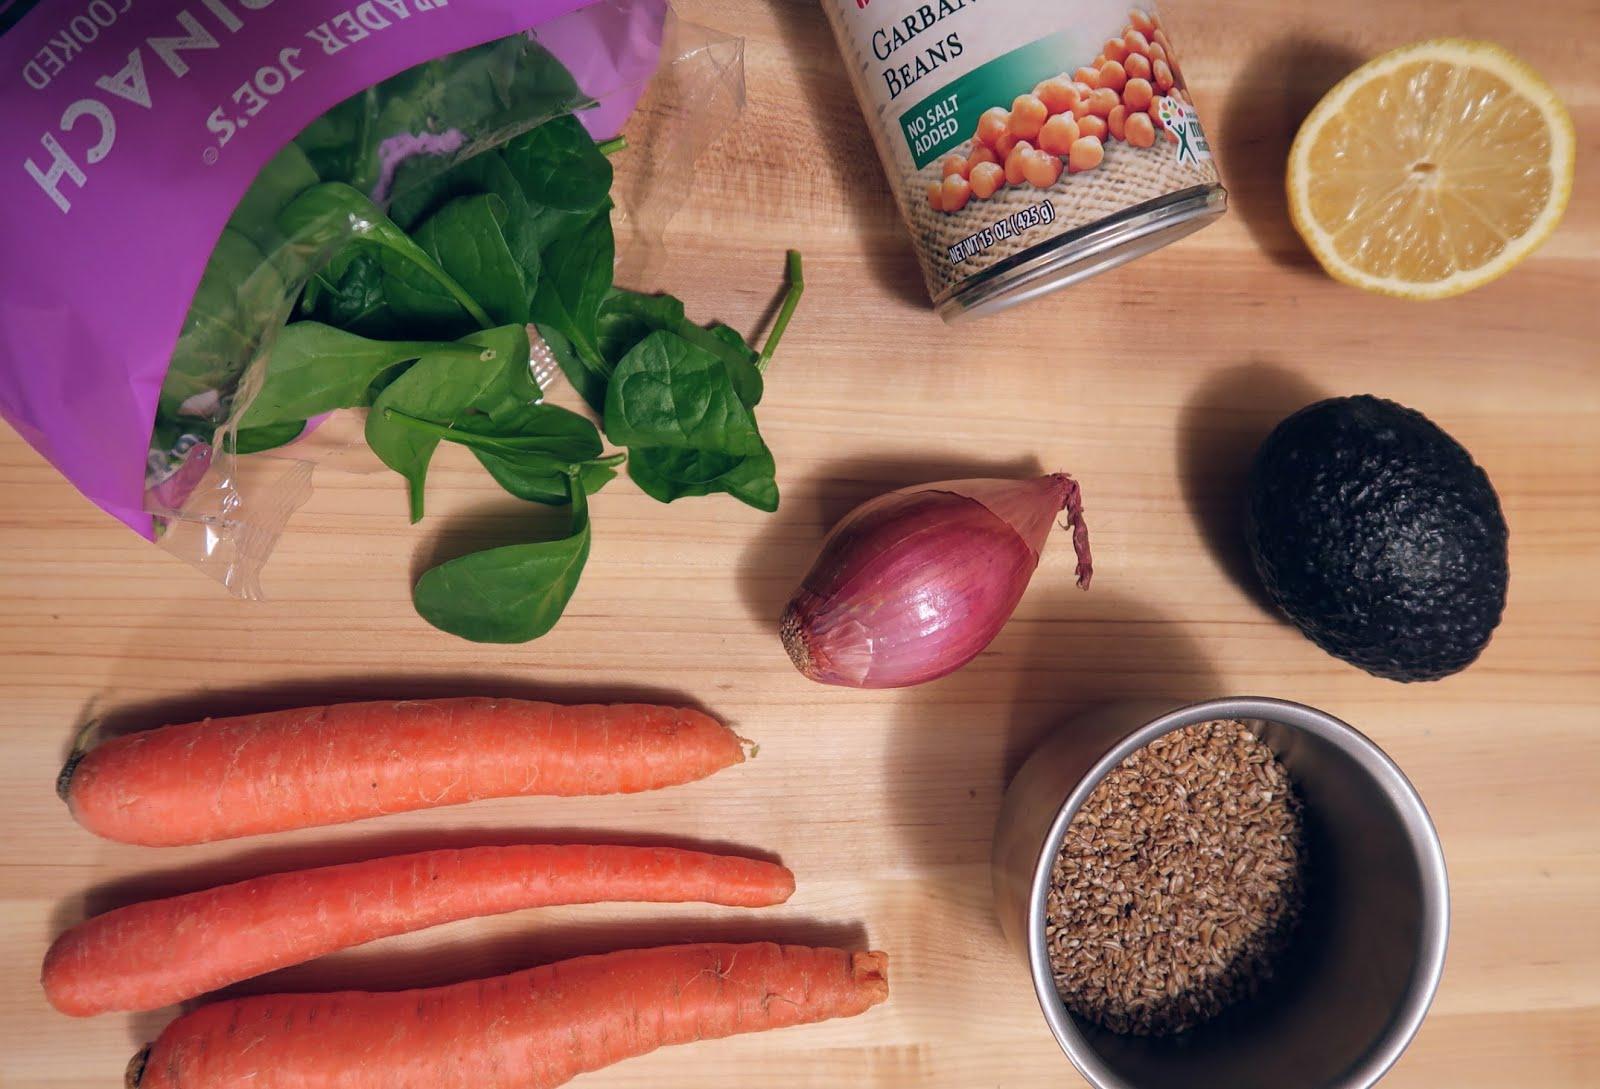 cooking healthy eating fitness diet vegan vegetarian new year resolution goal